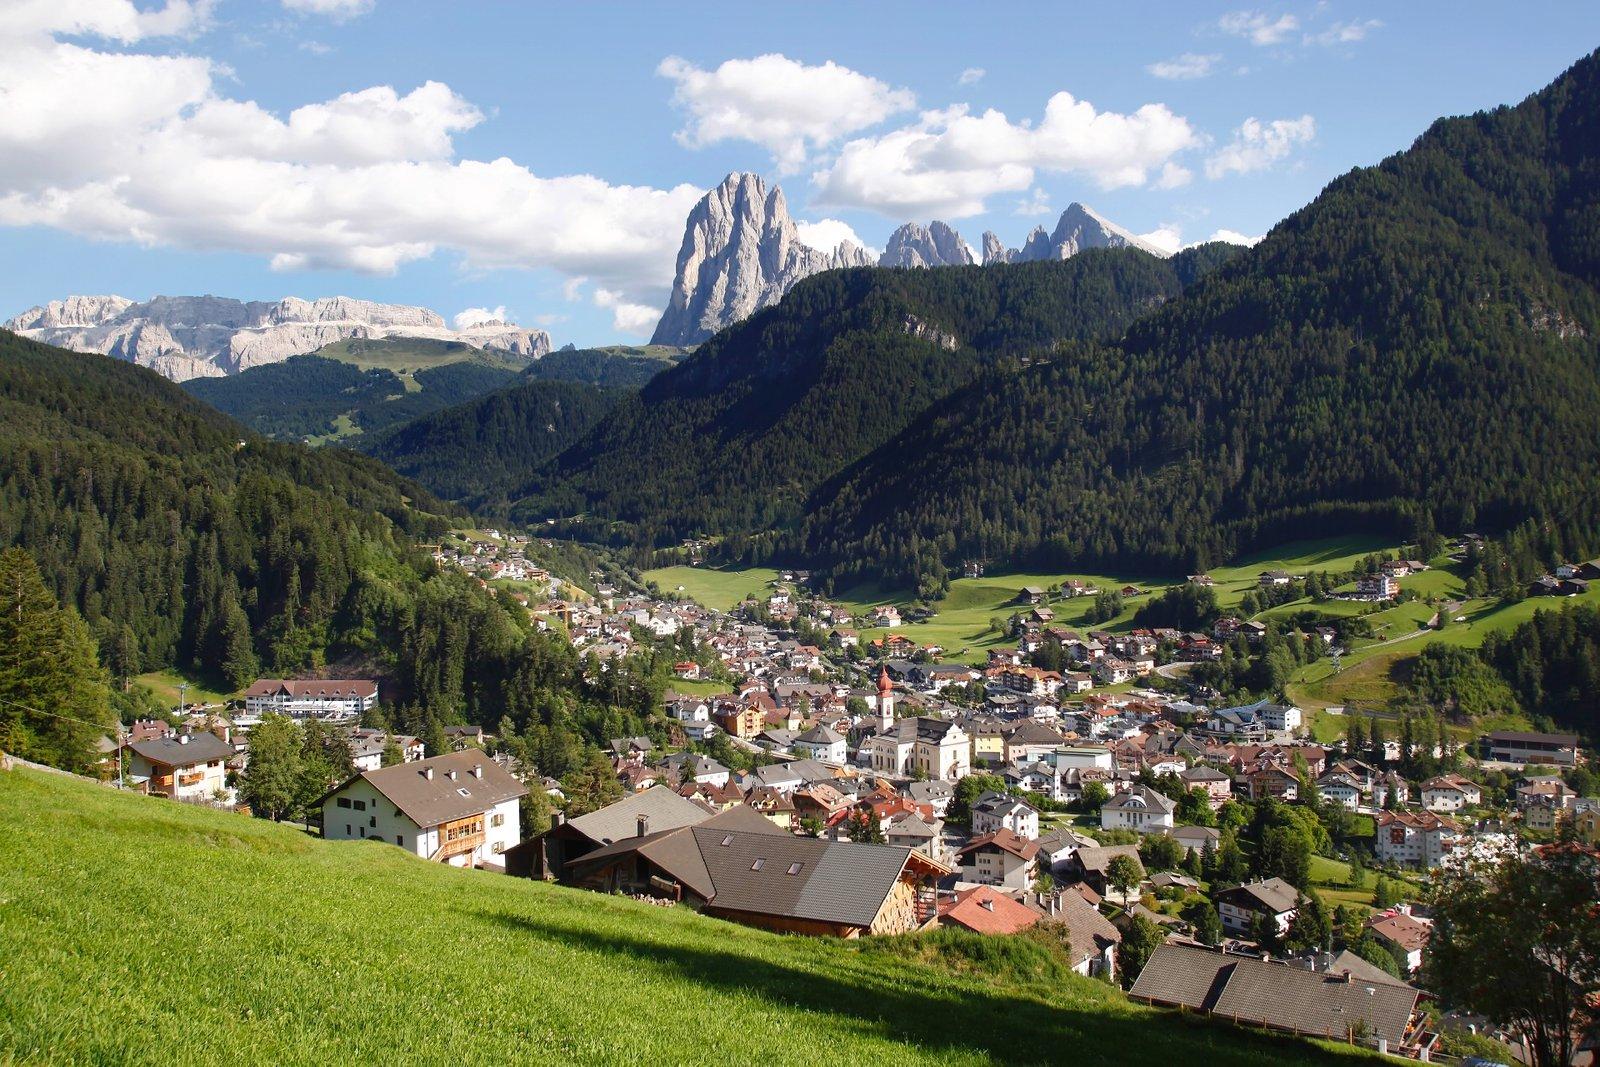 Ortisei/St. Ulrich ligt er prachtig bij (Foto: Panoramio)